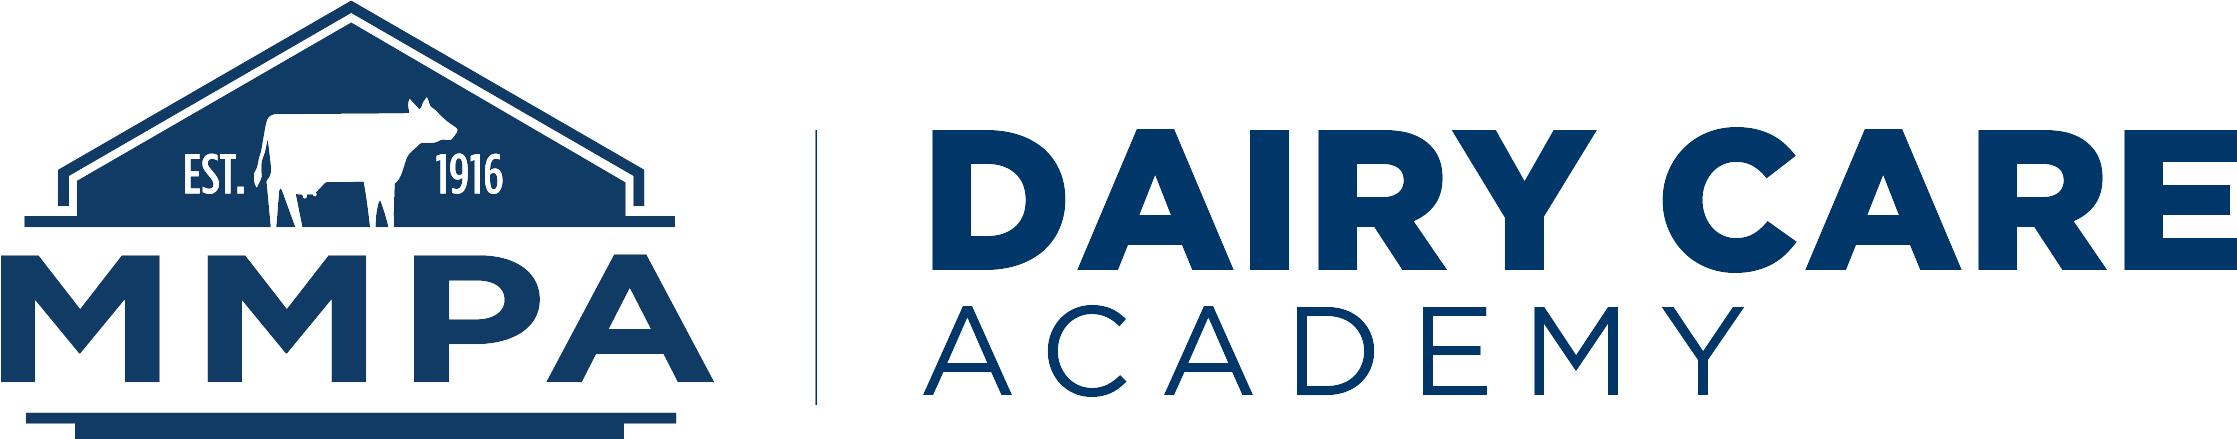 MMPA Dairy Care Academy - Animal Care Training - Logo